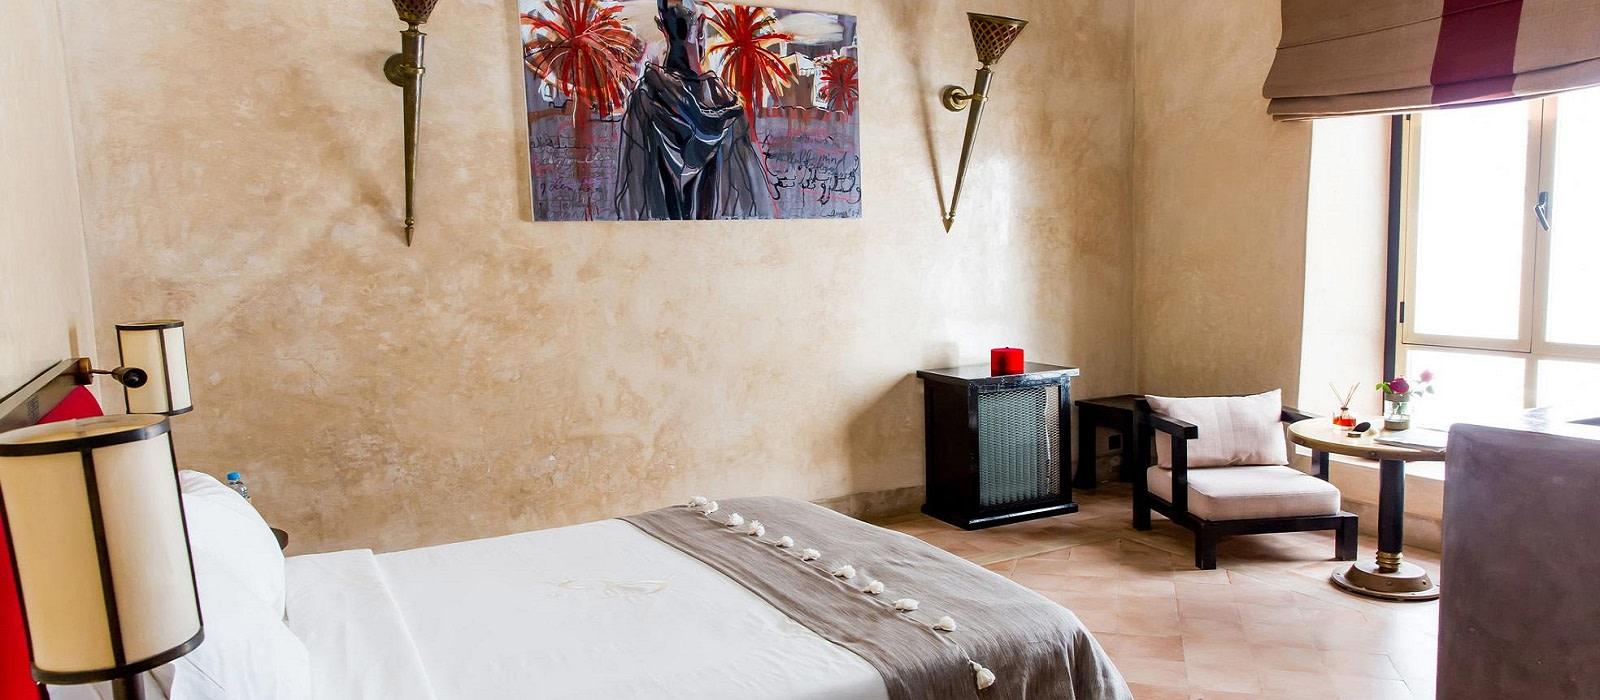 Hotel Madada Mogador Morocco